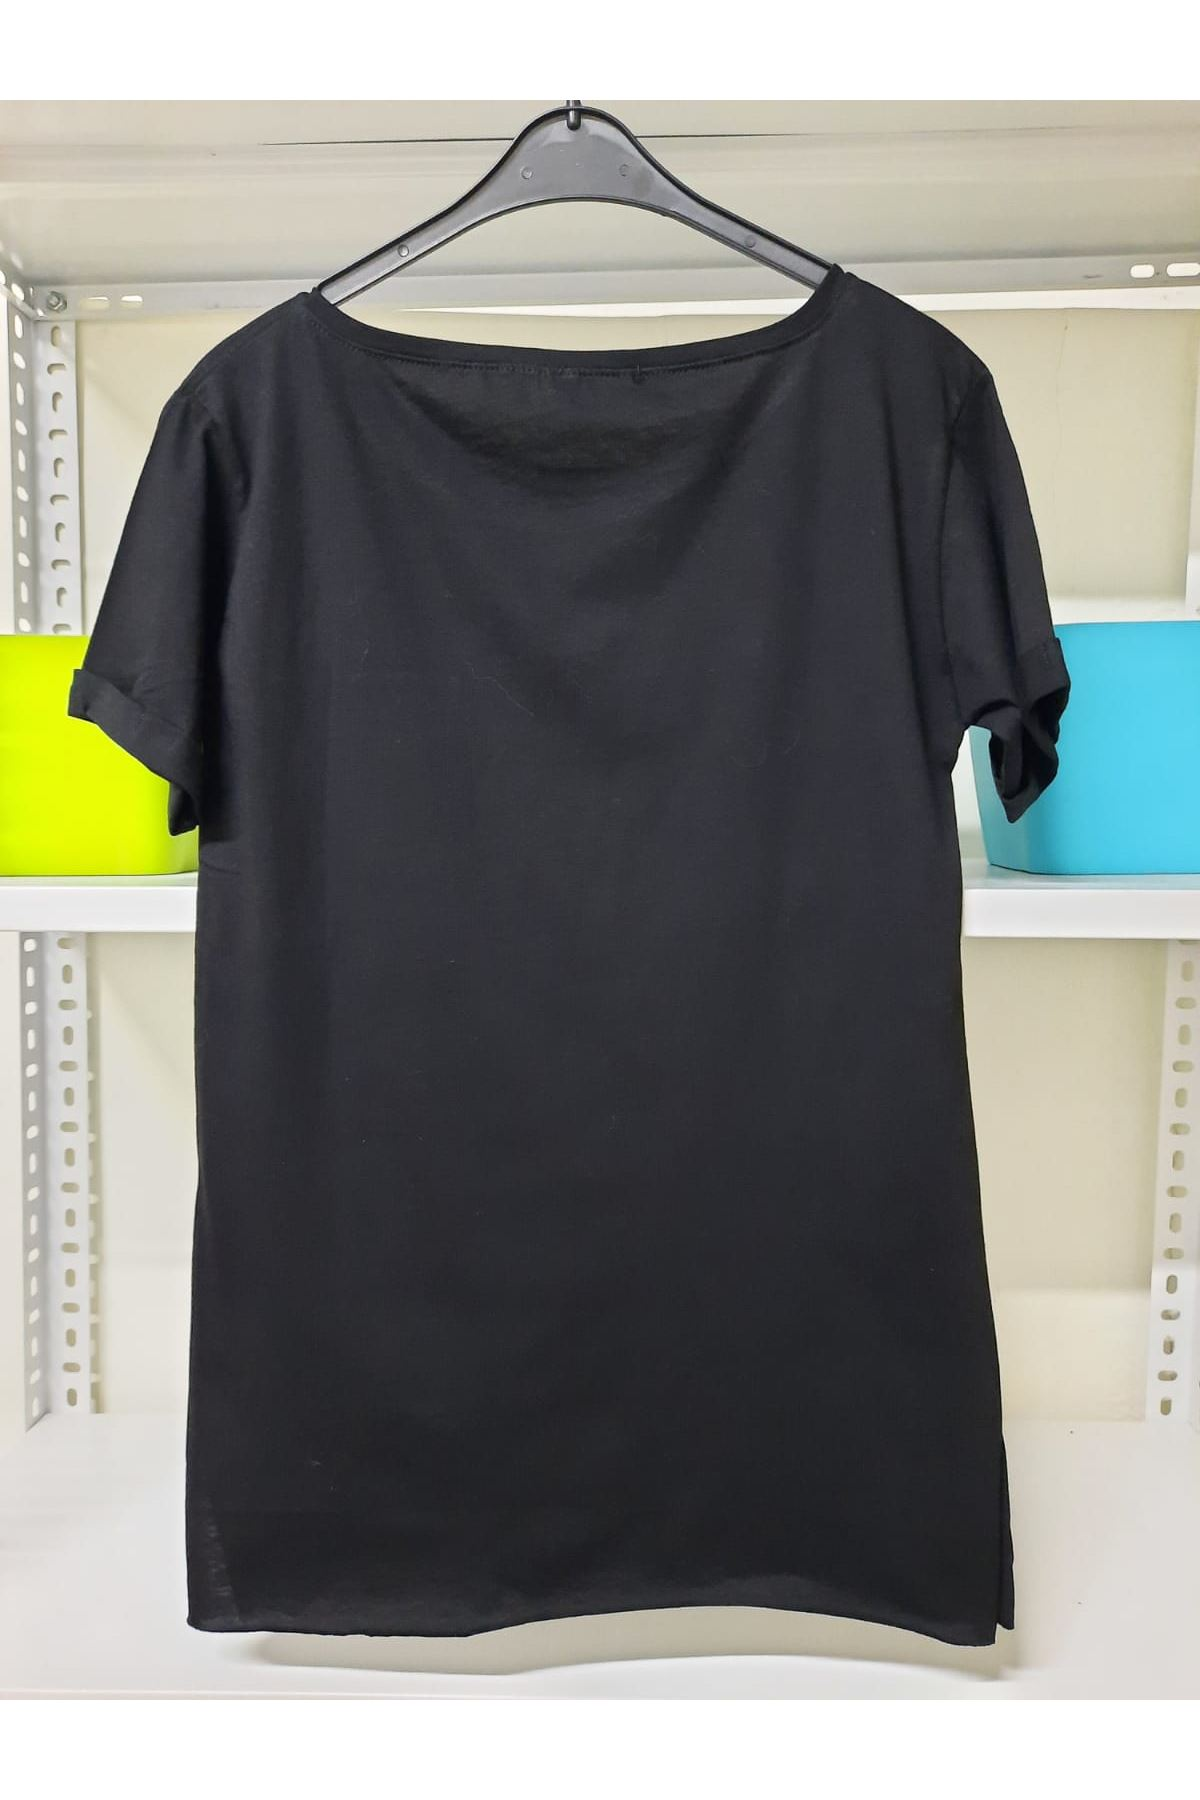 LV Cep Detaylı Tshirt - Siyah